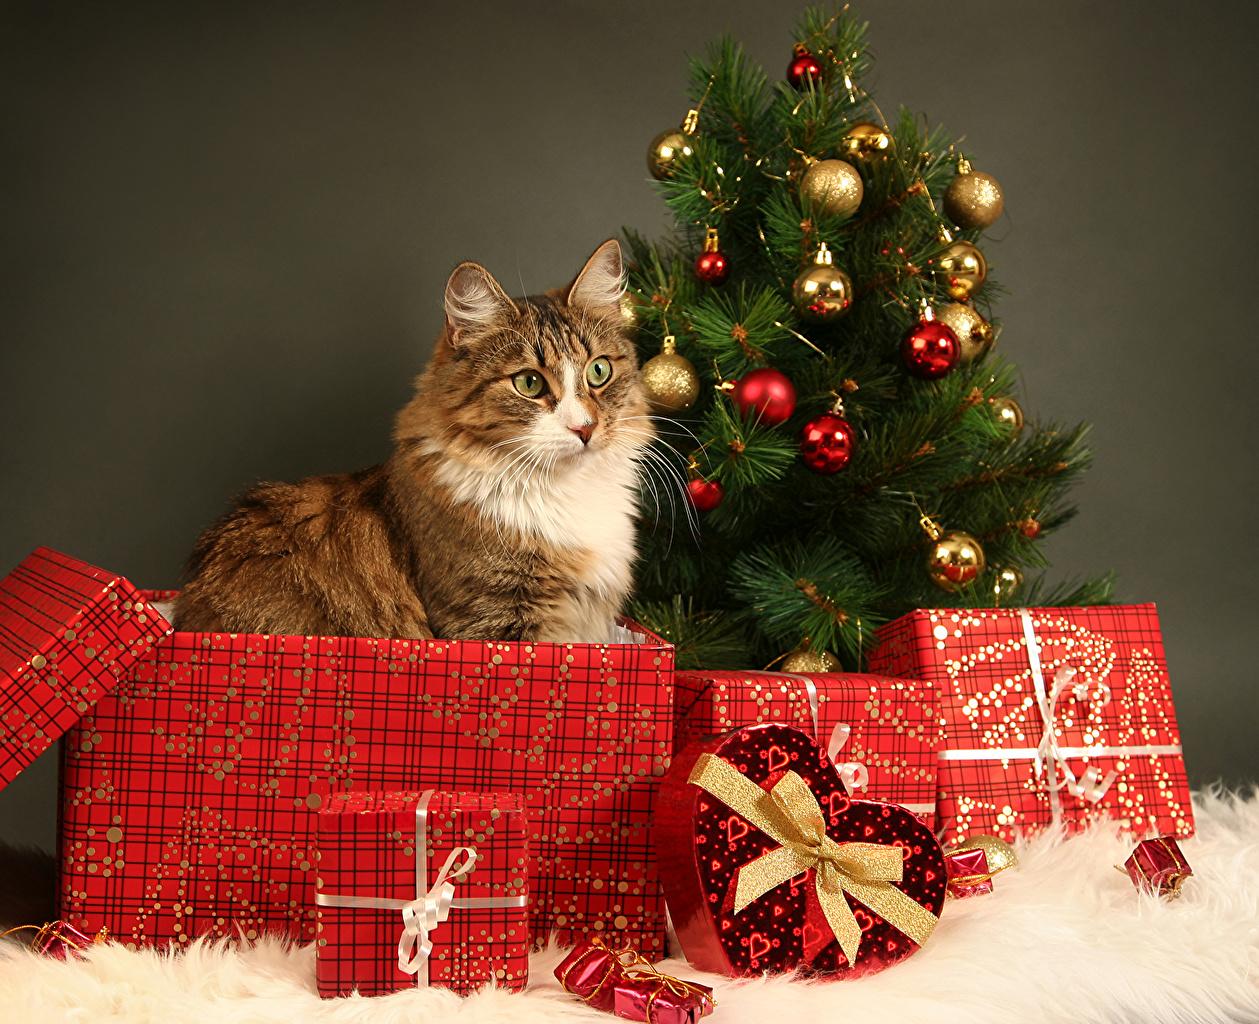 Image Cats Christmas New Year tree Box present Balls Bowknot Animals cat New year Christmas tree Gifts bow knot animal